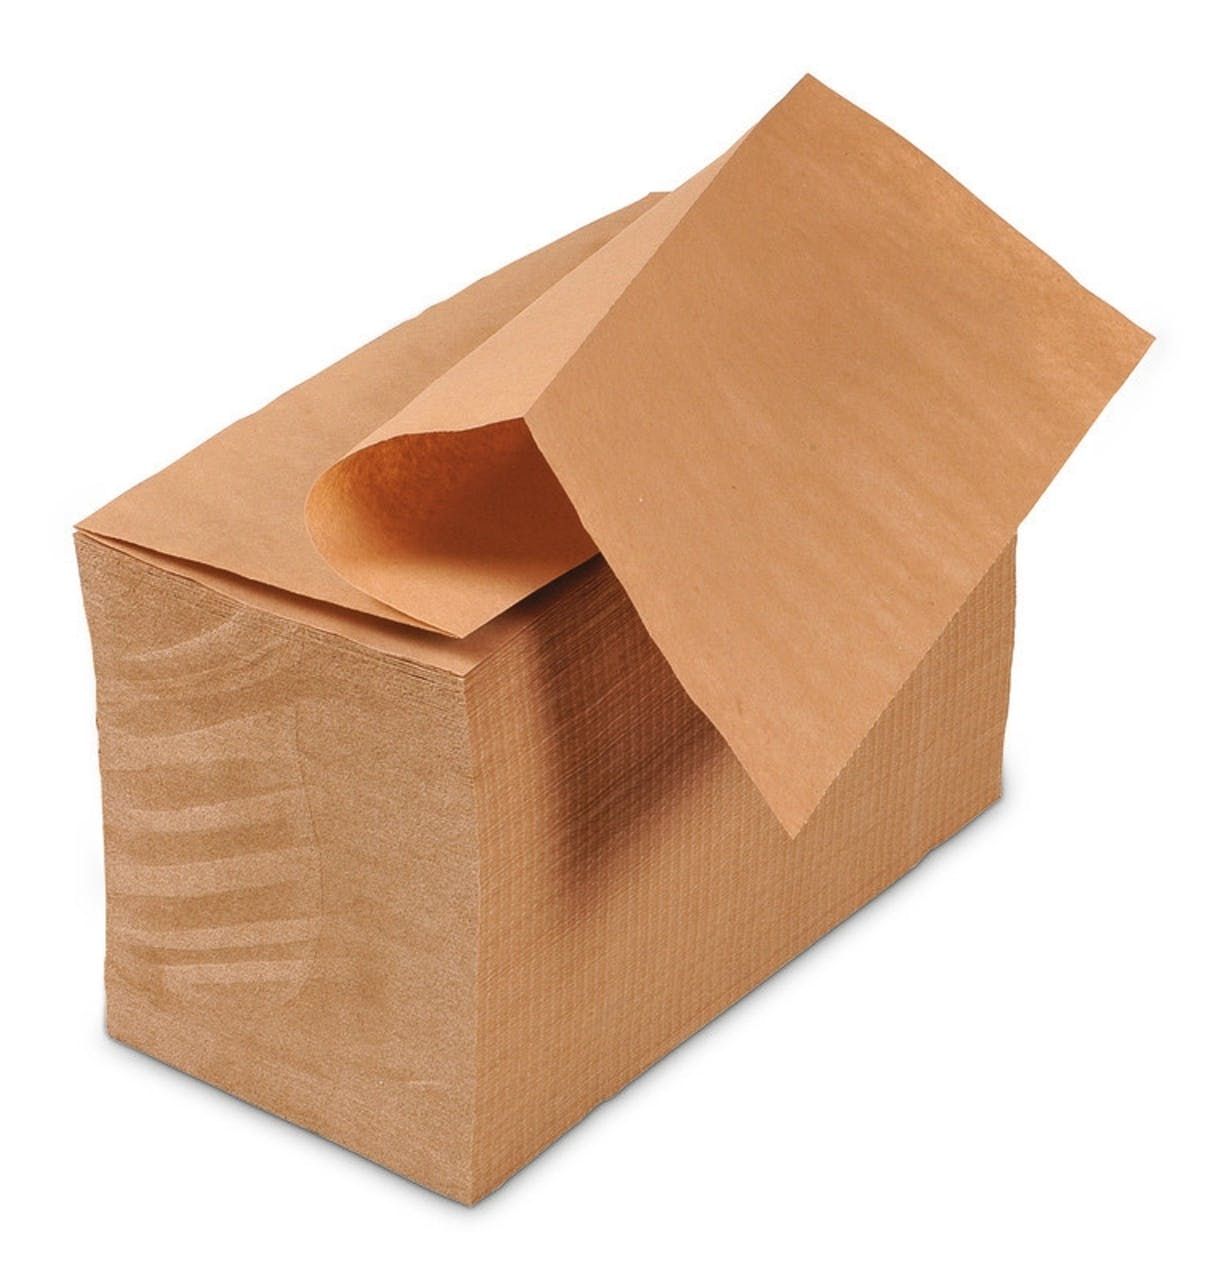 FillPak Papier für Papierfüllsysteme